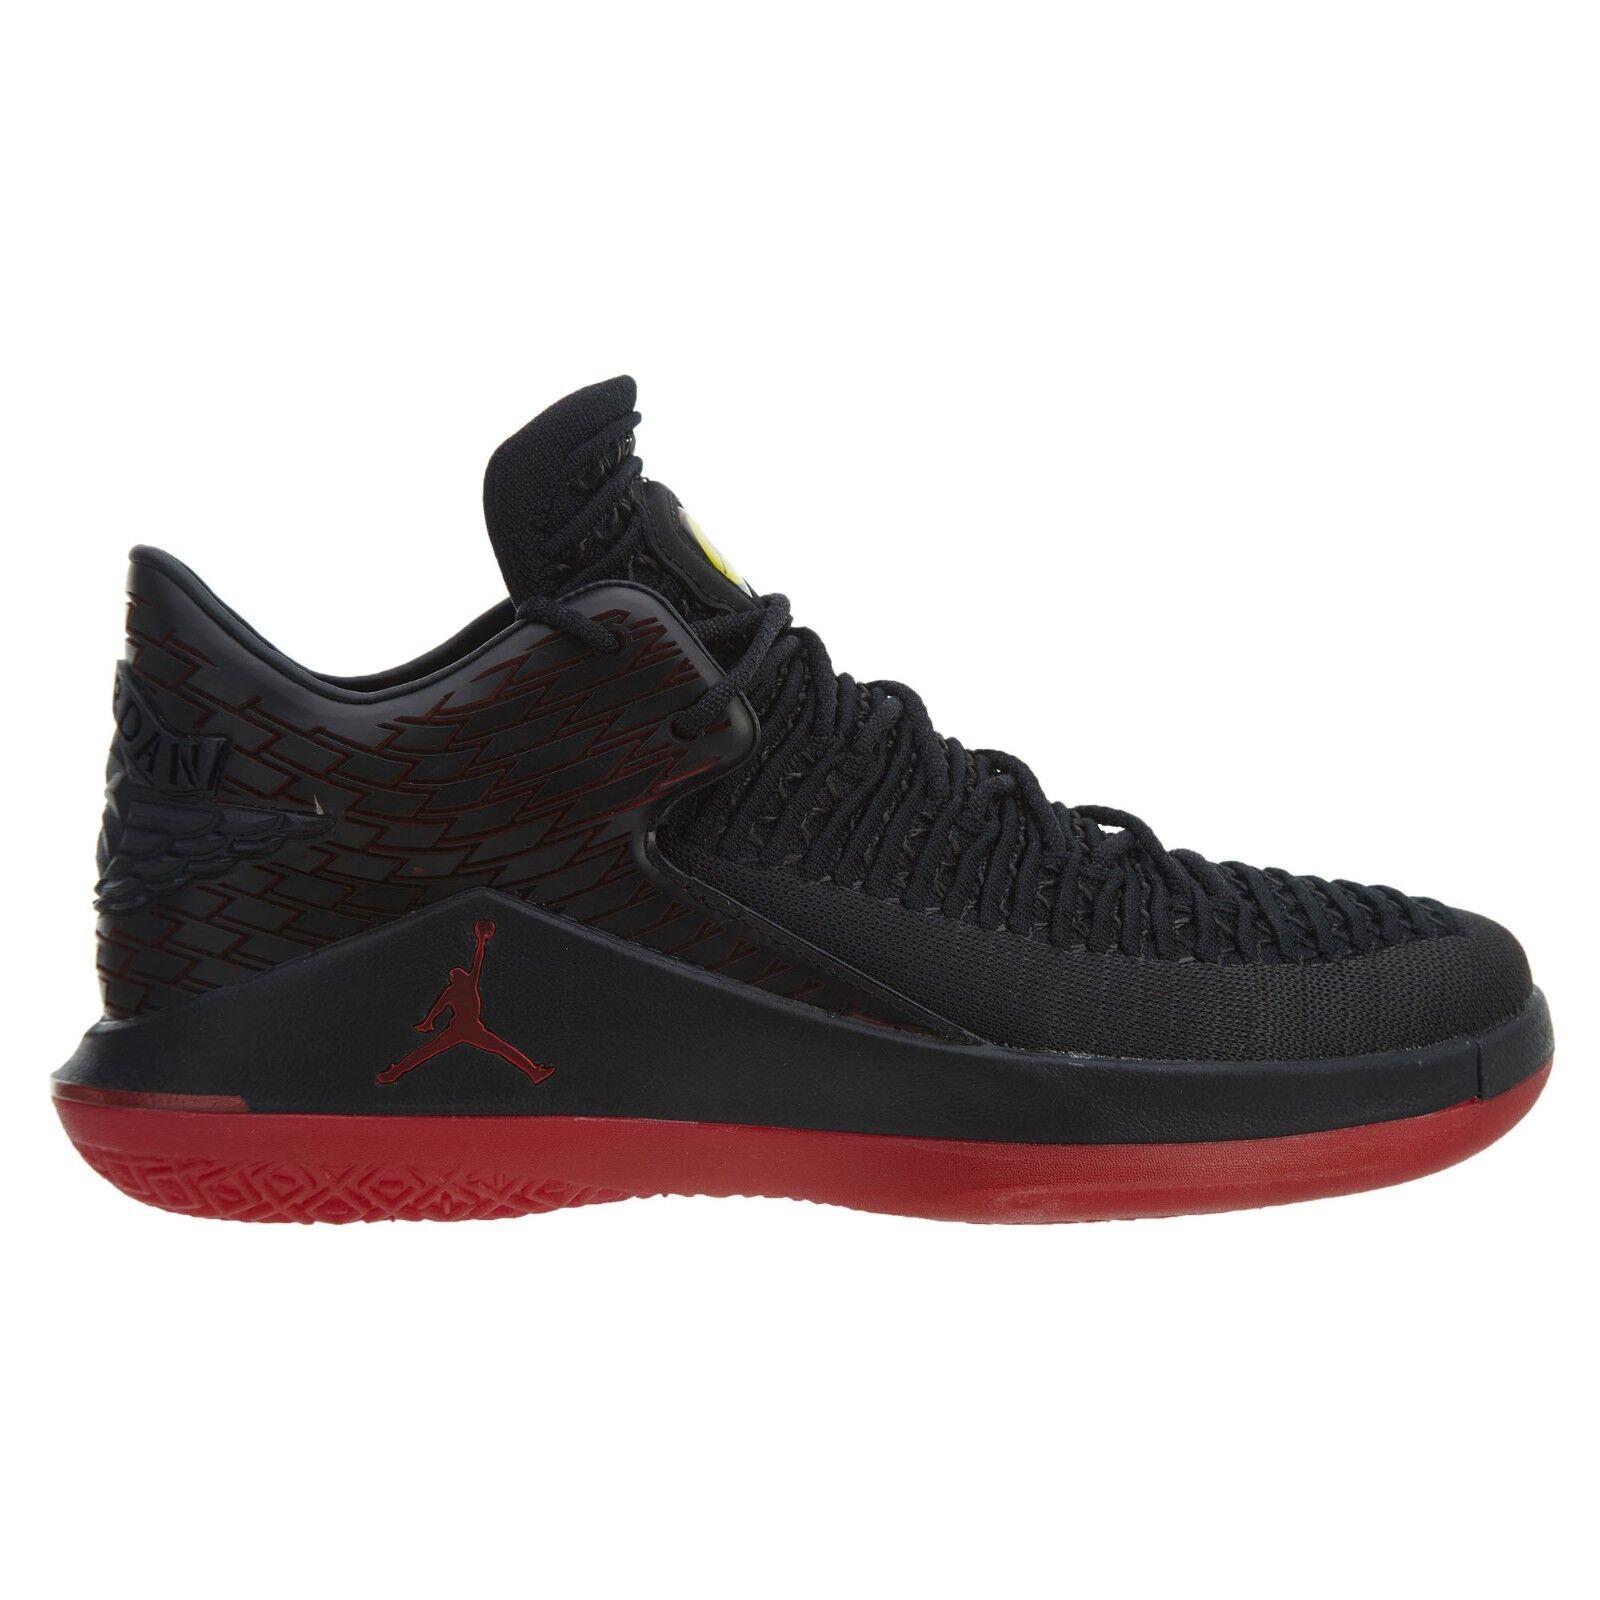 Air Jordan XXXII 32 Low Last Shot Mens AA1256-003 Black Gym Red Shoes Size 13